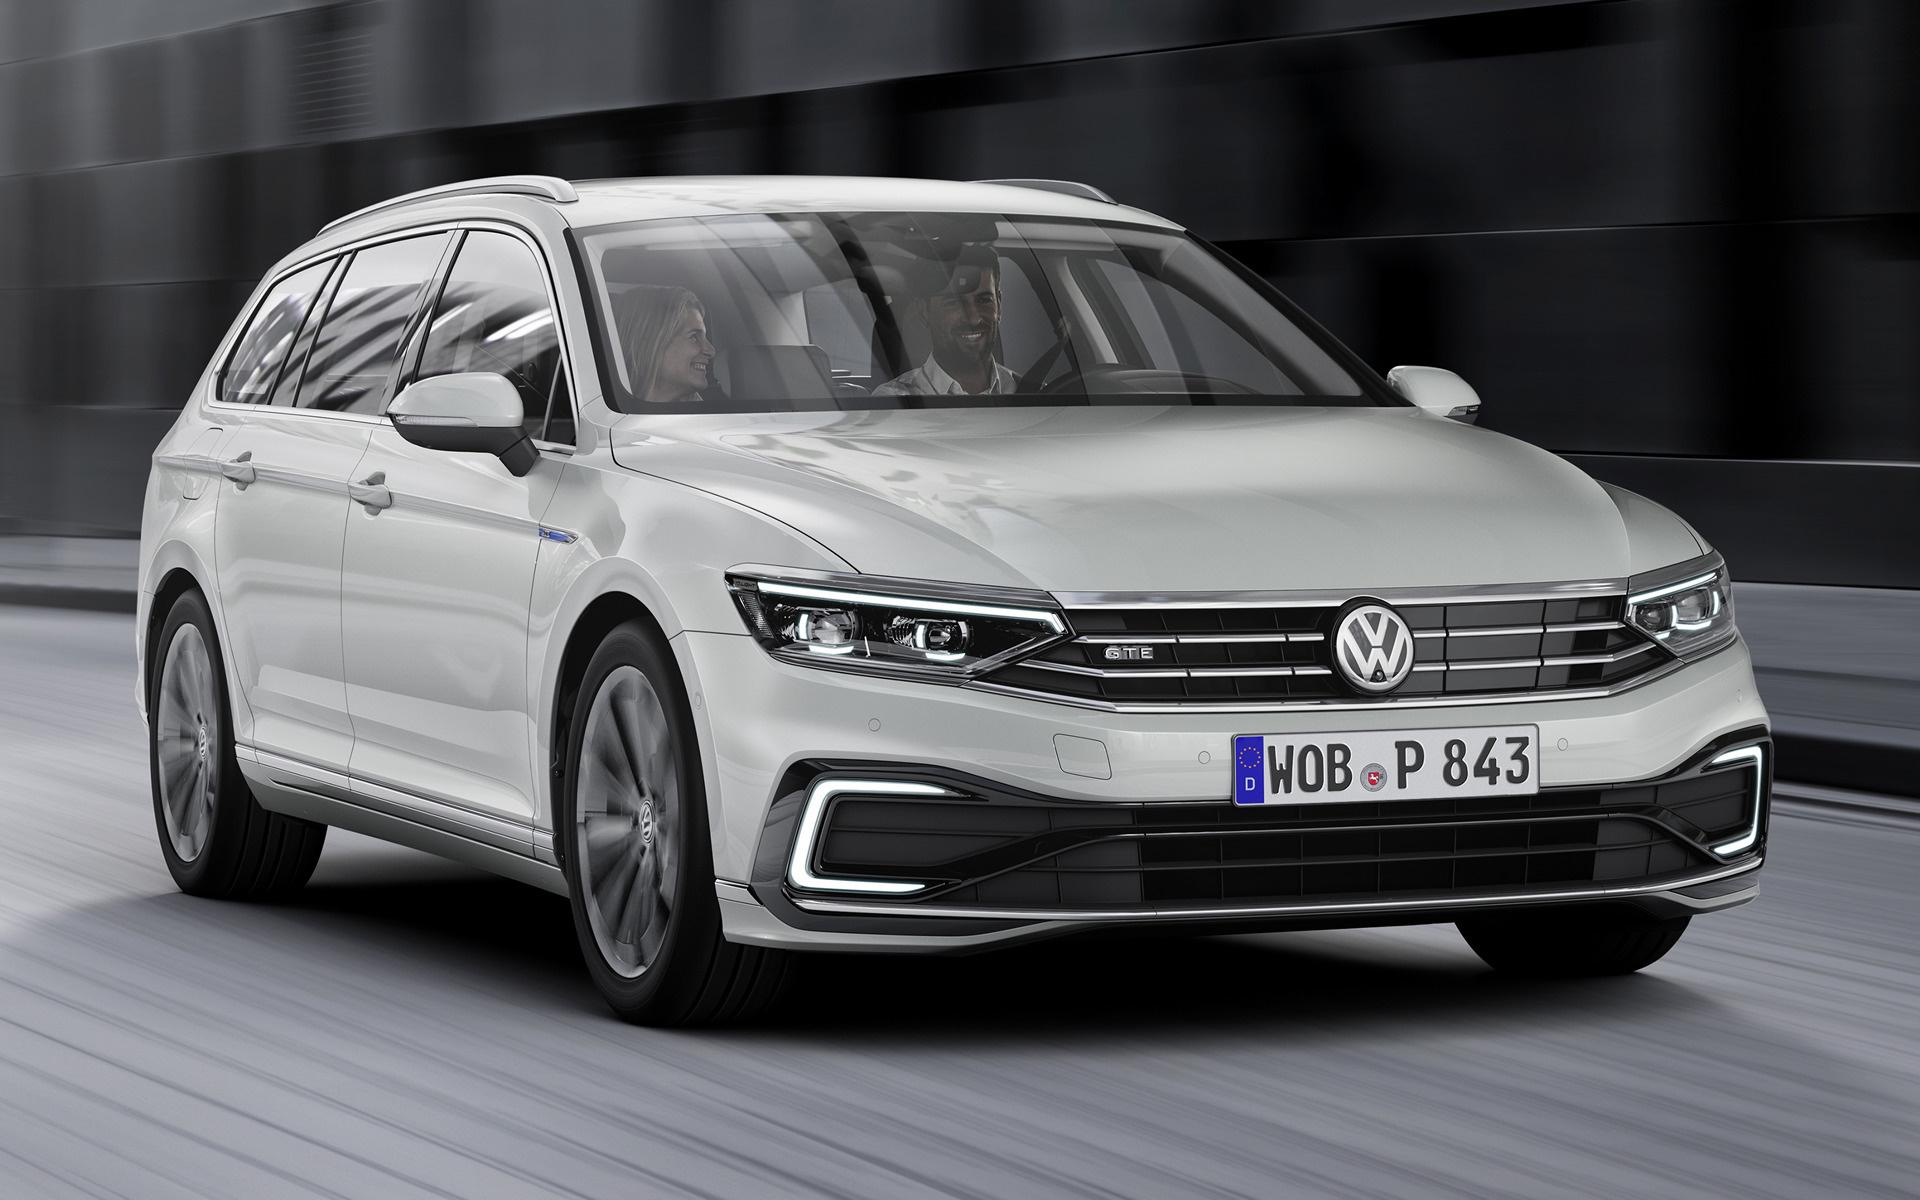 2019 Volkswagen Passat GTE Variant   Wallpapers and HD Images 1920x1200